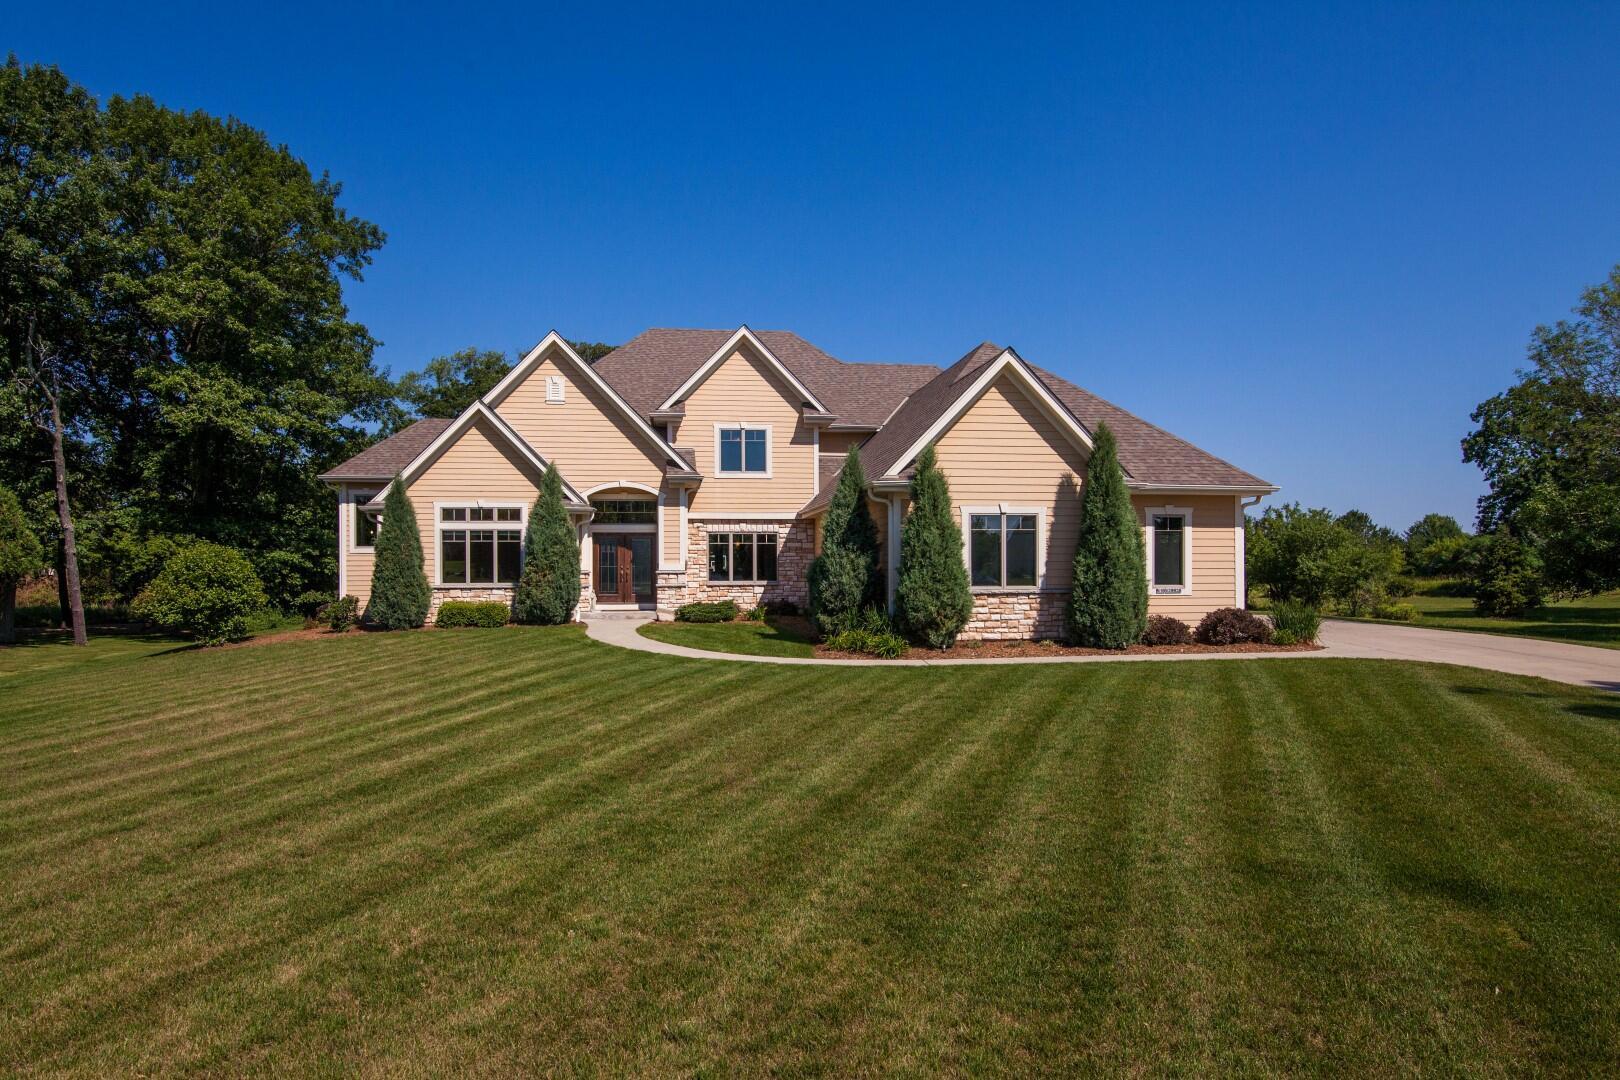 N16W29938 Brookstone Cir, Delafield, Wisconsin 53072, 5 Bedrooms Bedrooms, 13 Rooms Rooms,3 BathroomsBathrooms,Single-Family,For Sale,Brookstone Cir,1750104